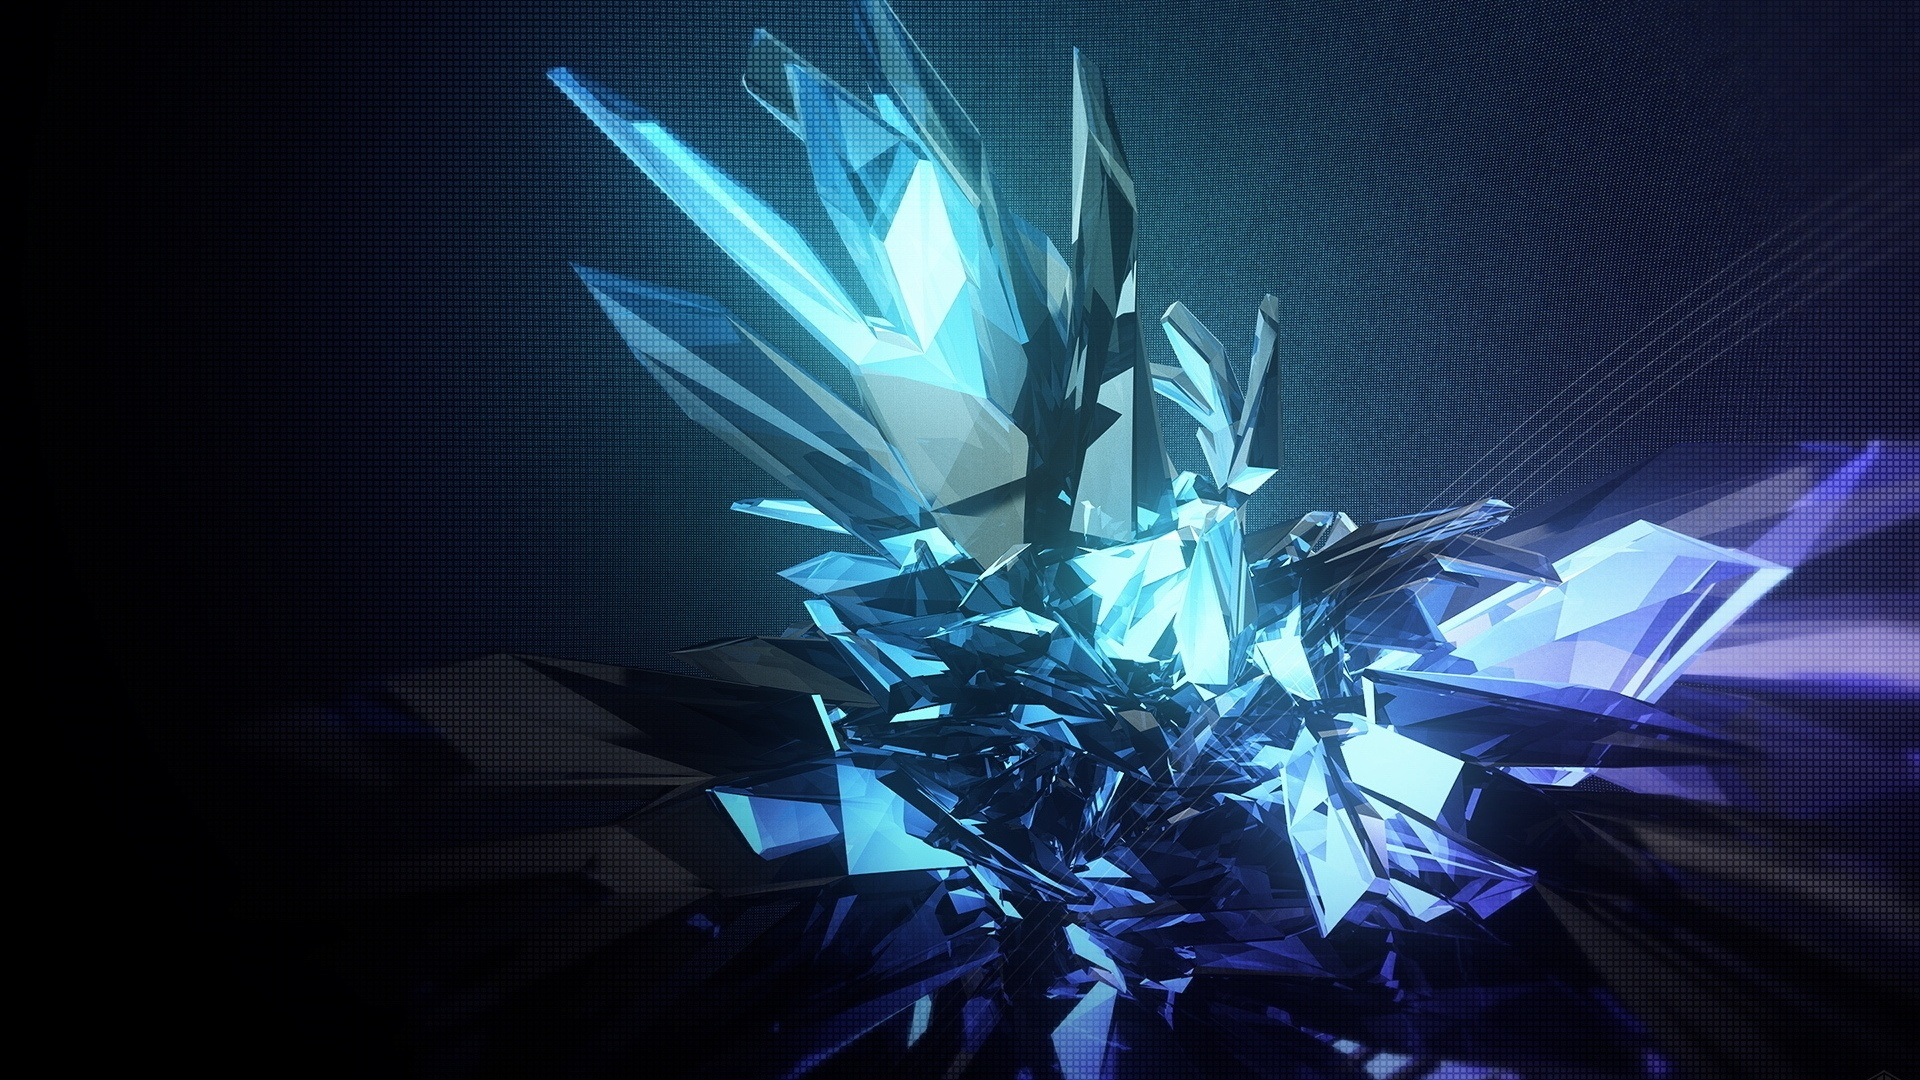 Crystals Wallpaper theme